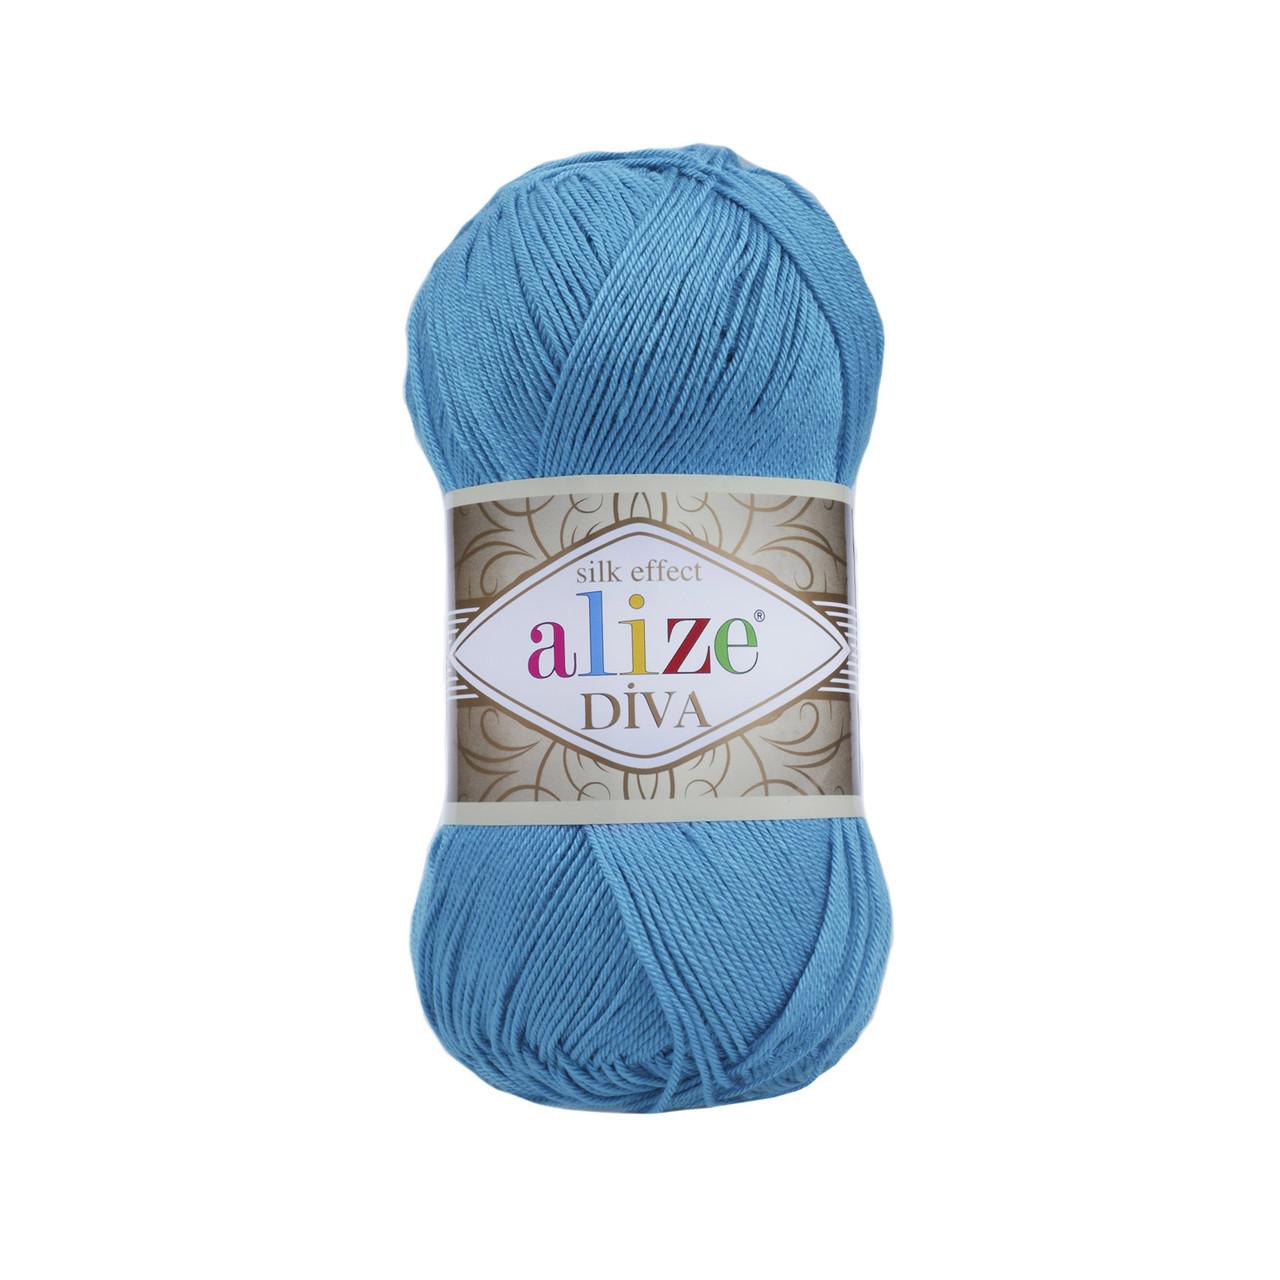 Пряжа Ализе Дива Alize Diva, цвет №245 бирюзовый